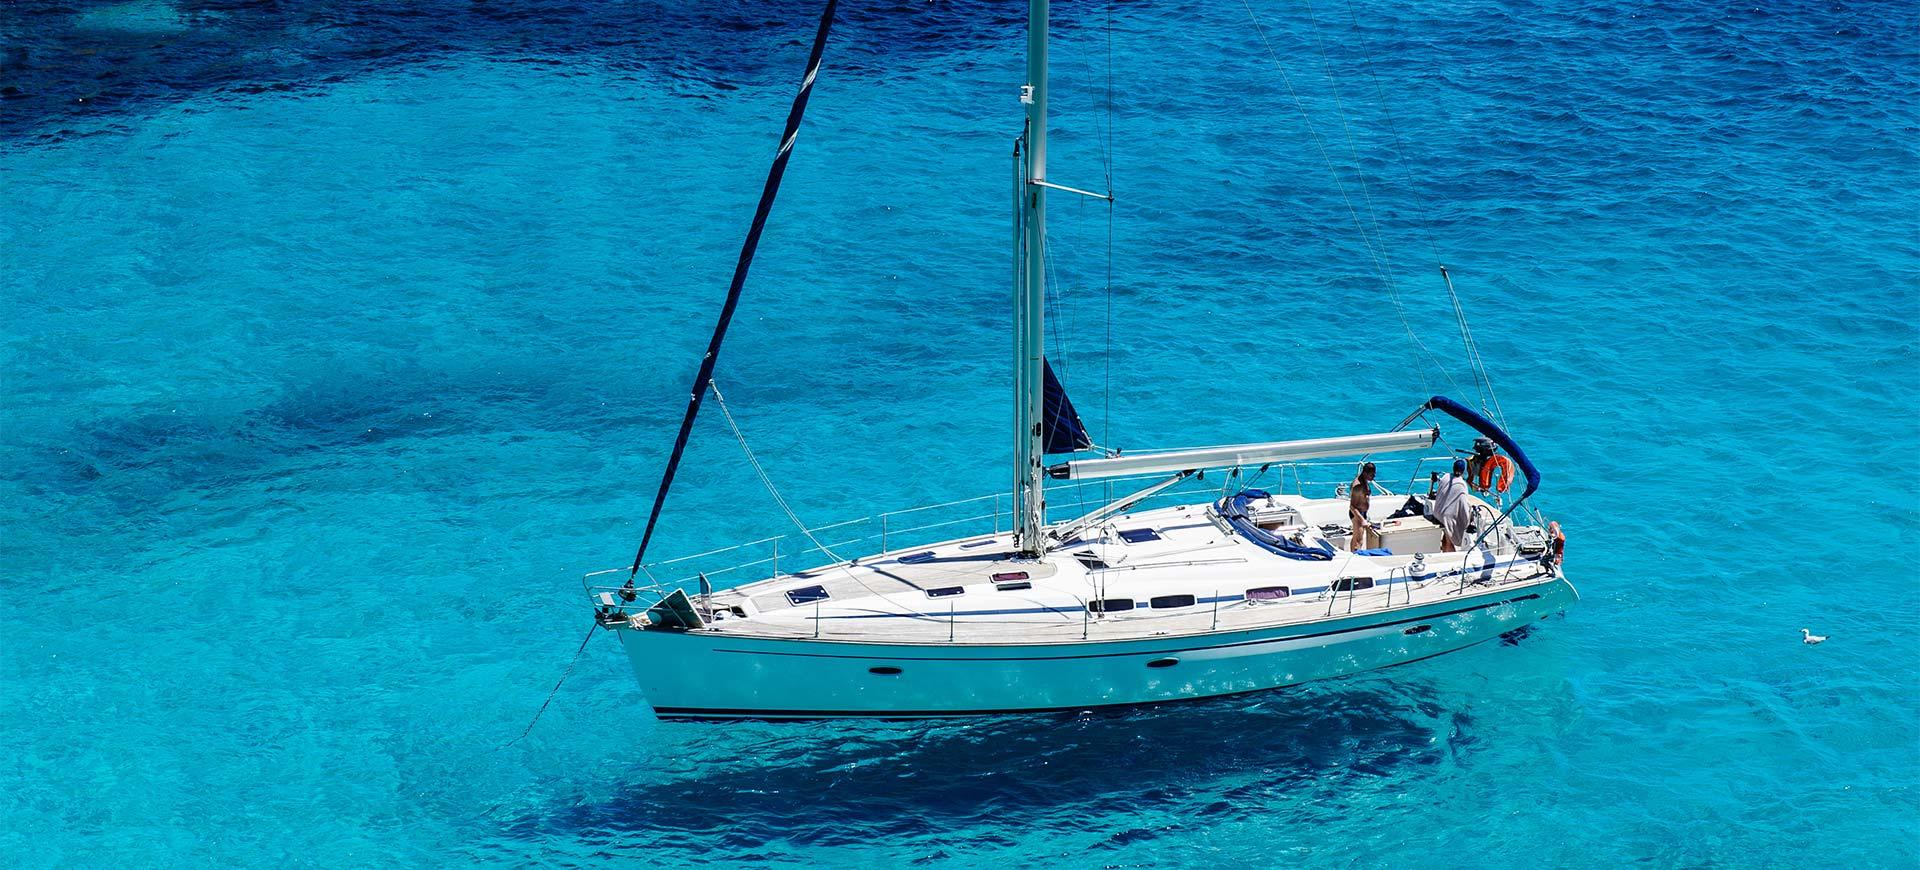 10 Tage segeln - Noa Yachting